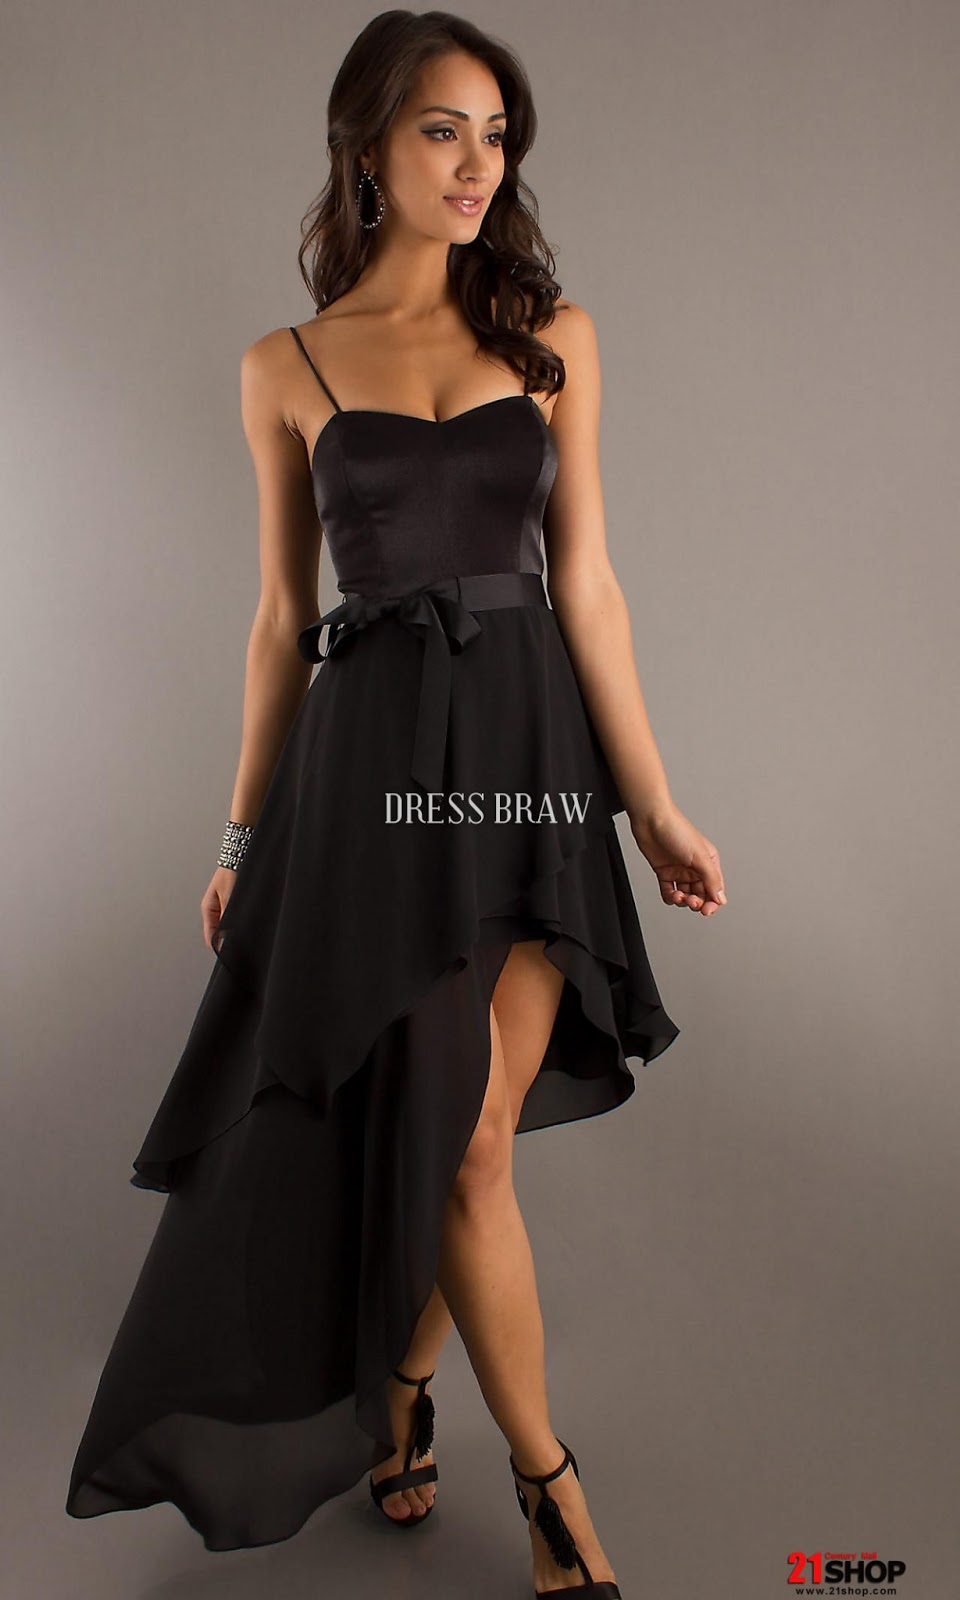 Black Cocktail Dress 2013 Say 24